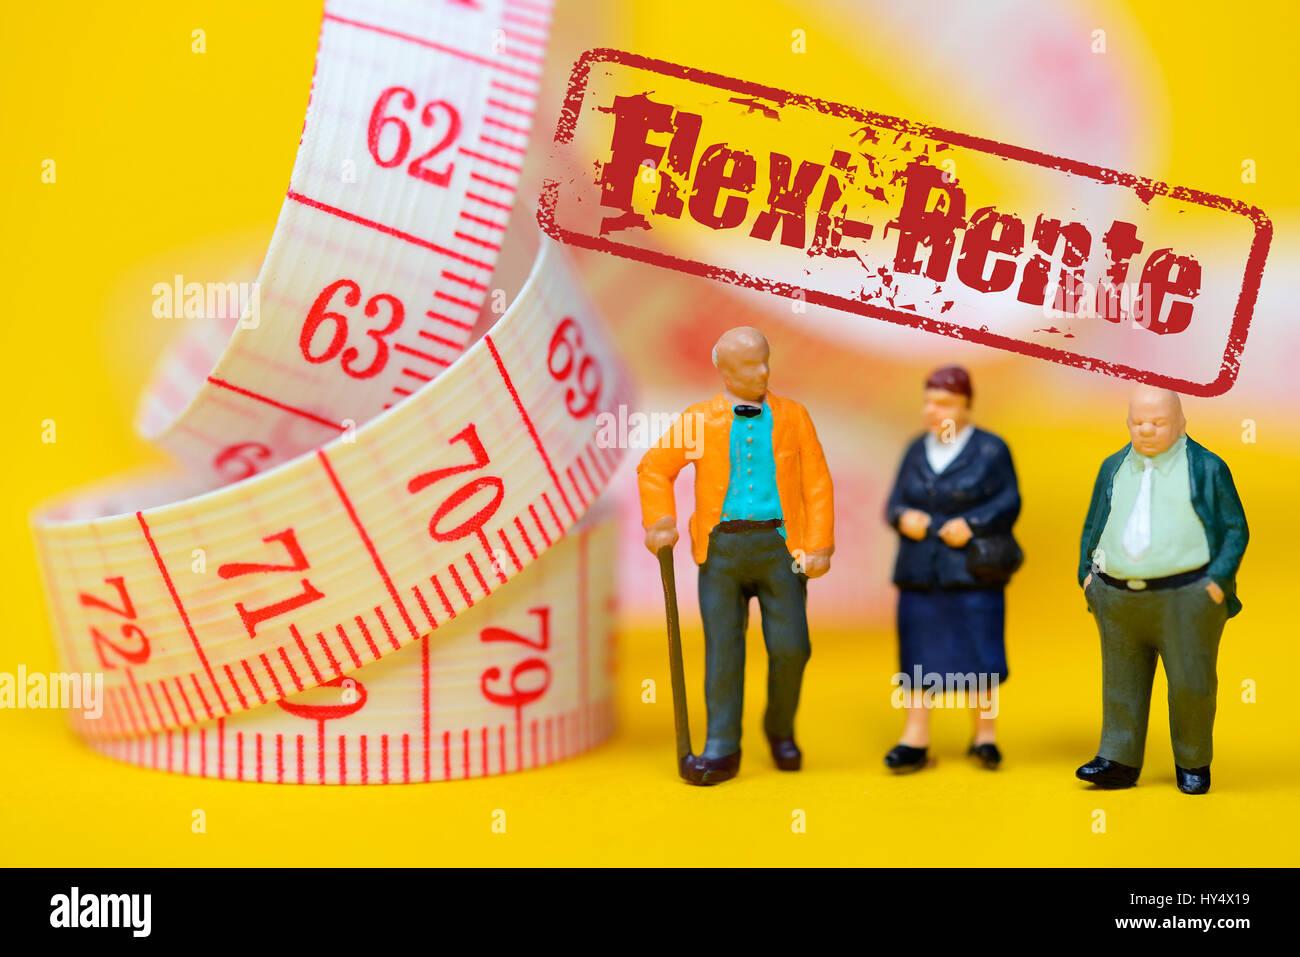 Senior citizens and dimension tape, symbolic photo Flexi pension, Senioren und Ma?band, Symbolfoto Flexi-Rente Stock Photo